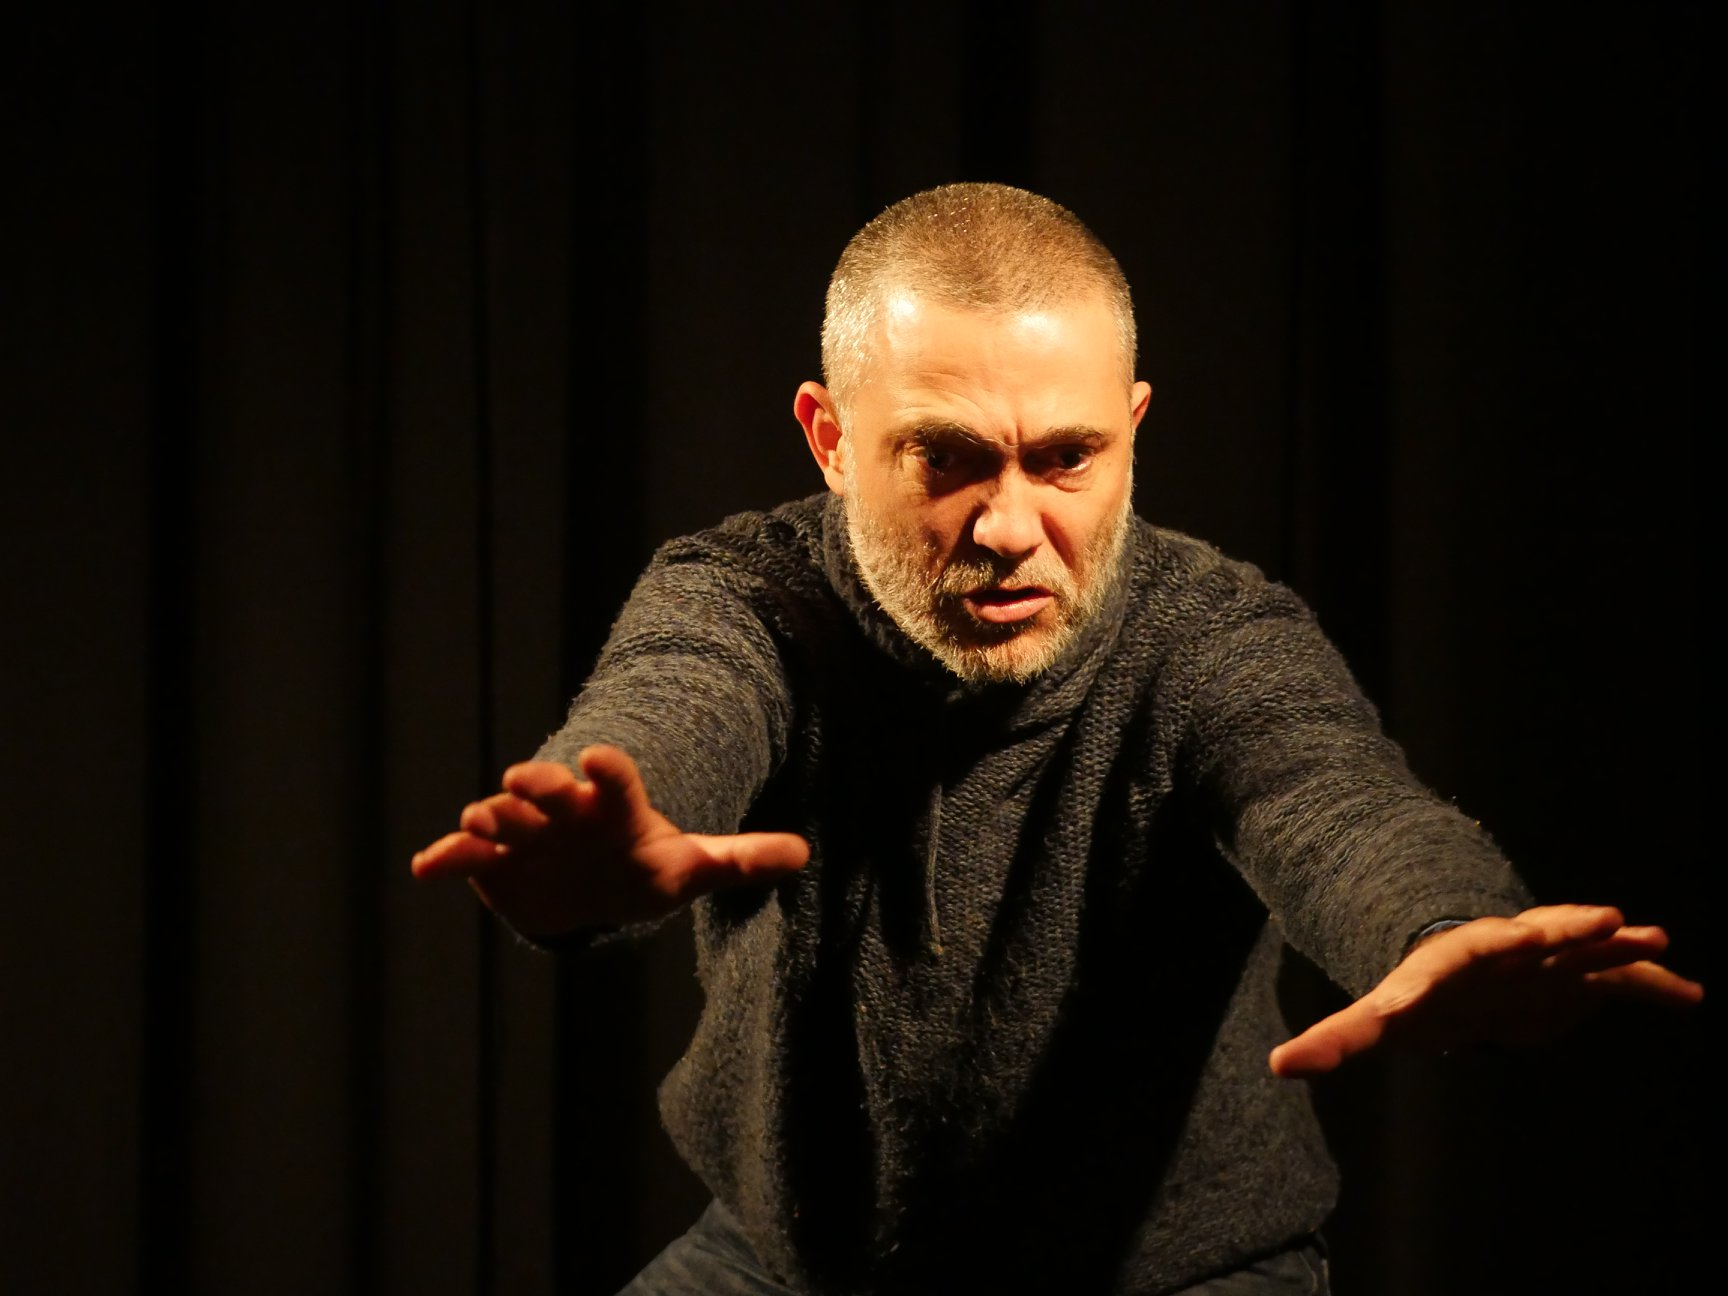 Pablo Fernando- O ator e amáscara curso intensivo - teatro do gesto-máscara larvária comédia humana